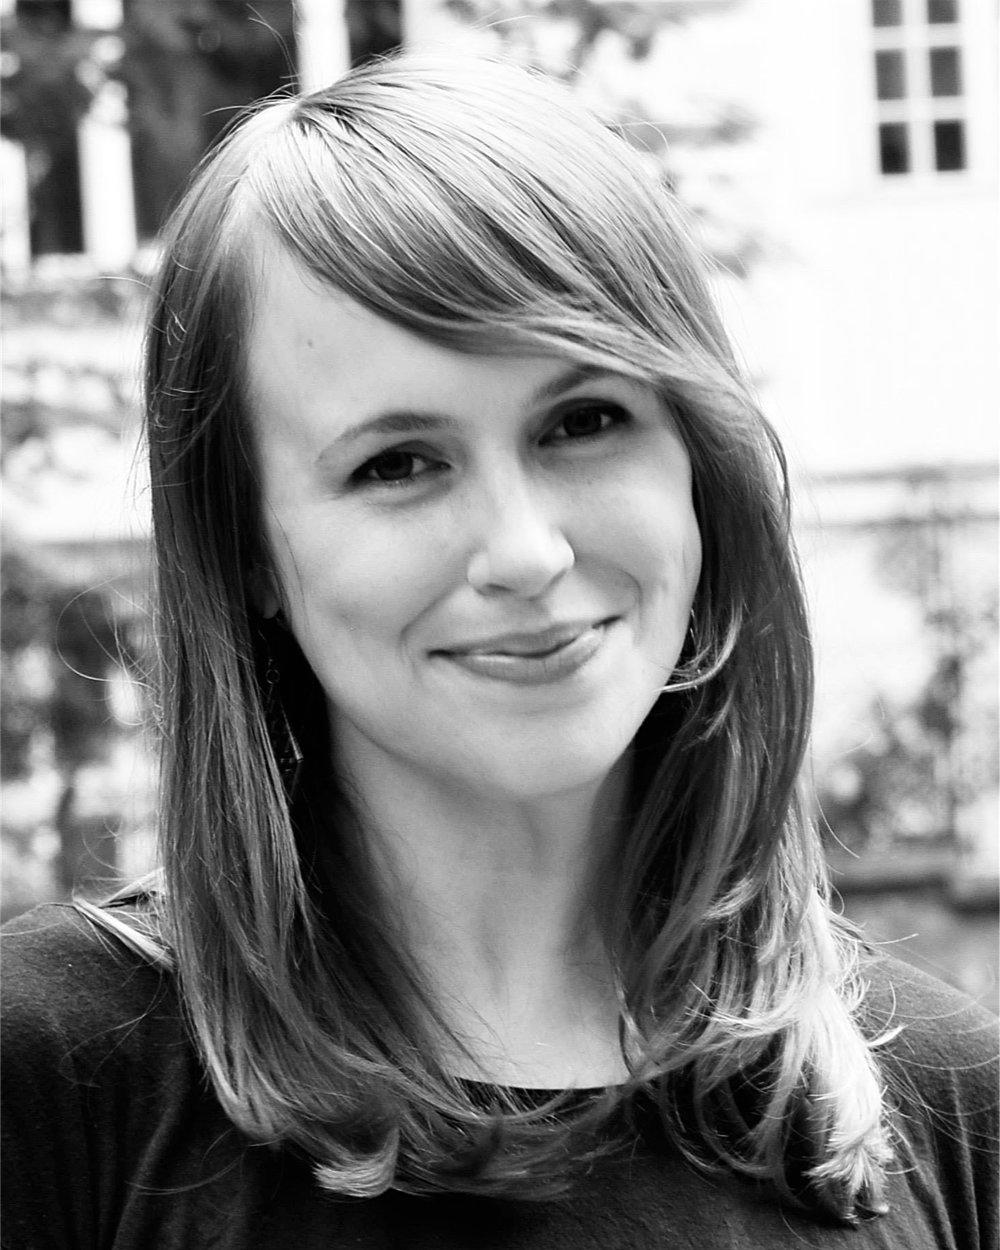 Die Autorin Bettina Rosenberger